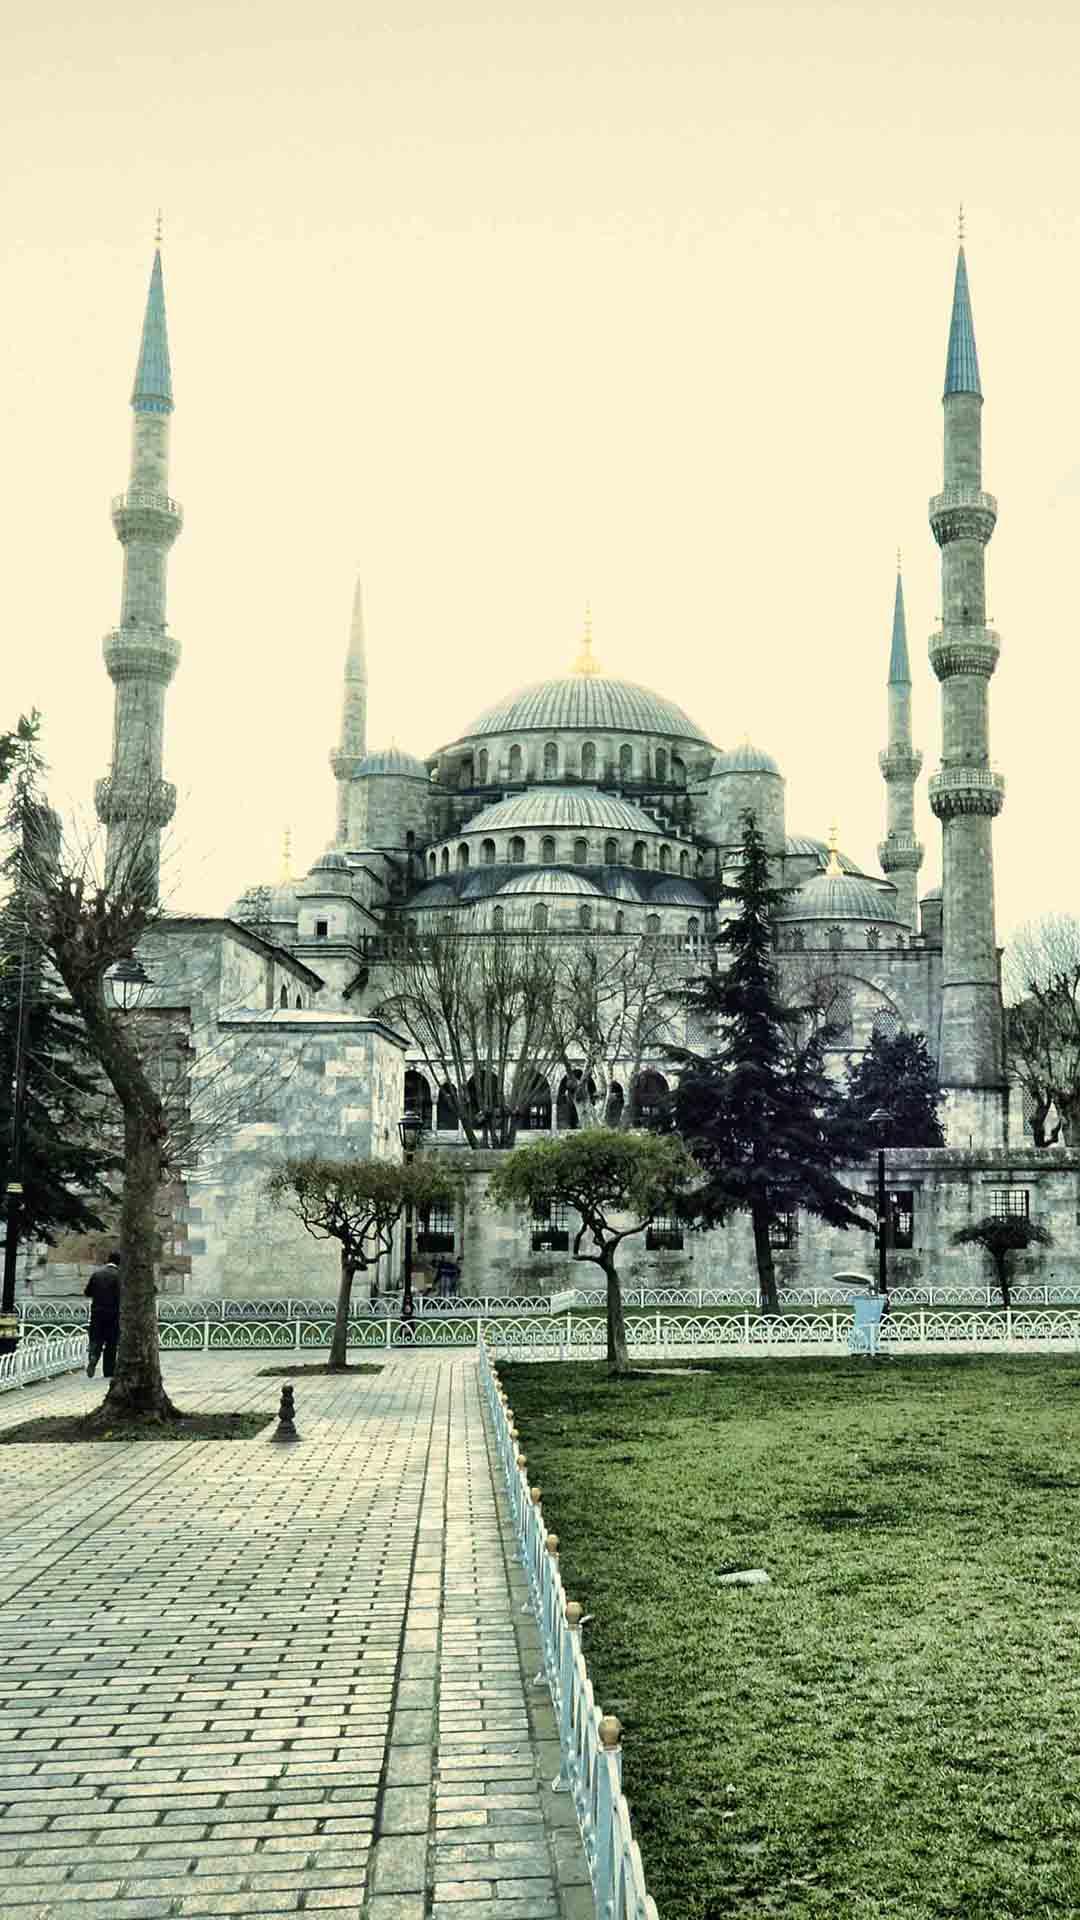 Hong Kong Wallpaper Iphone X Turkey Sultan Ahmed Mosque Iphone Wallpaper Hd